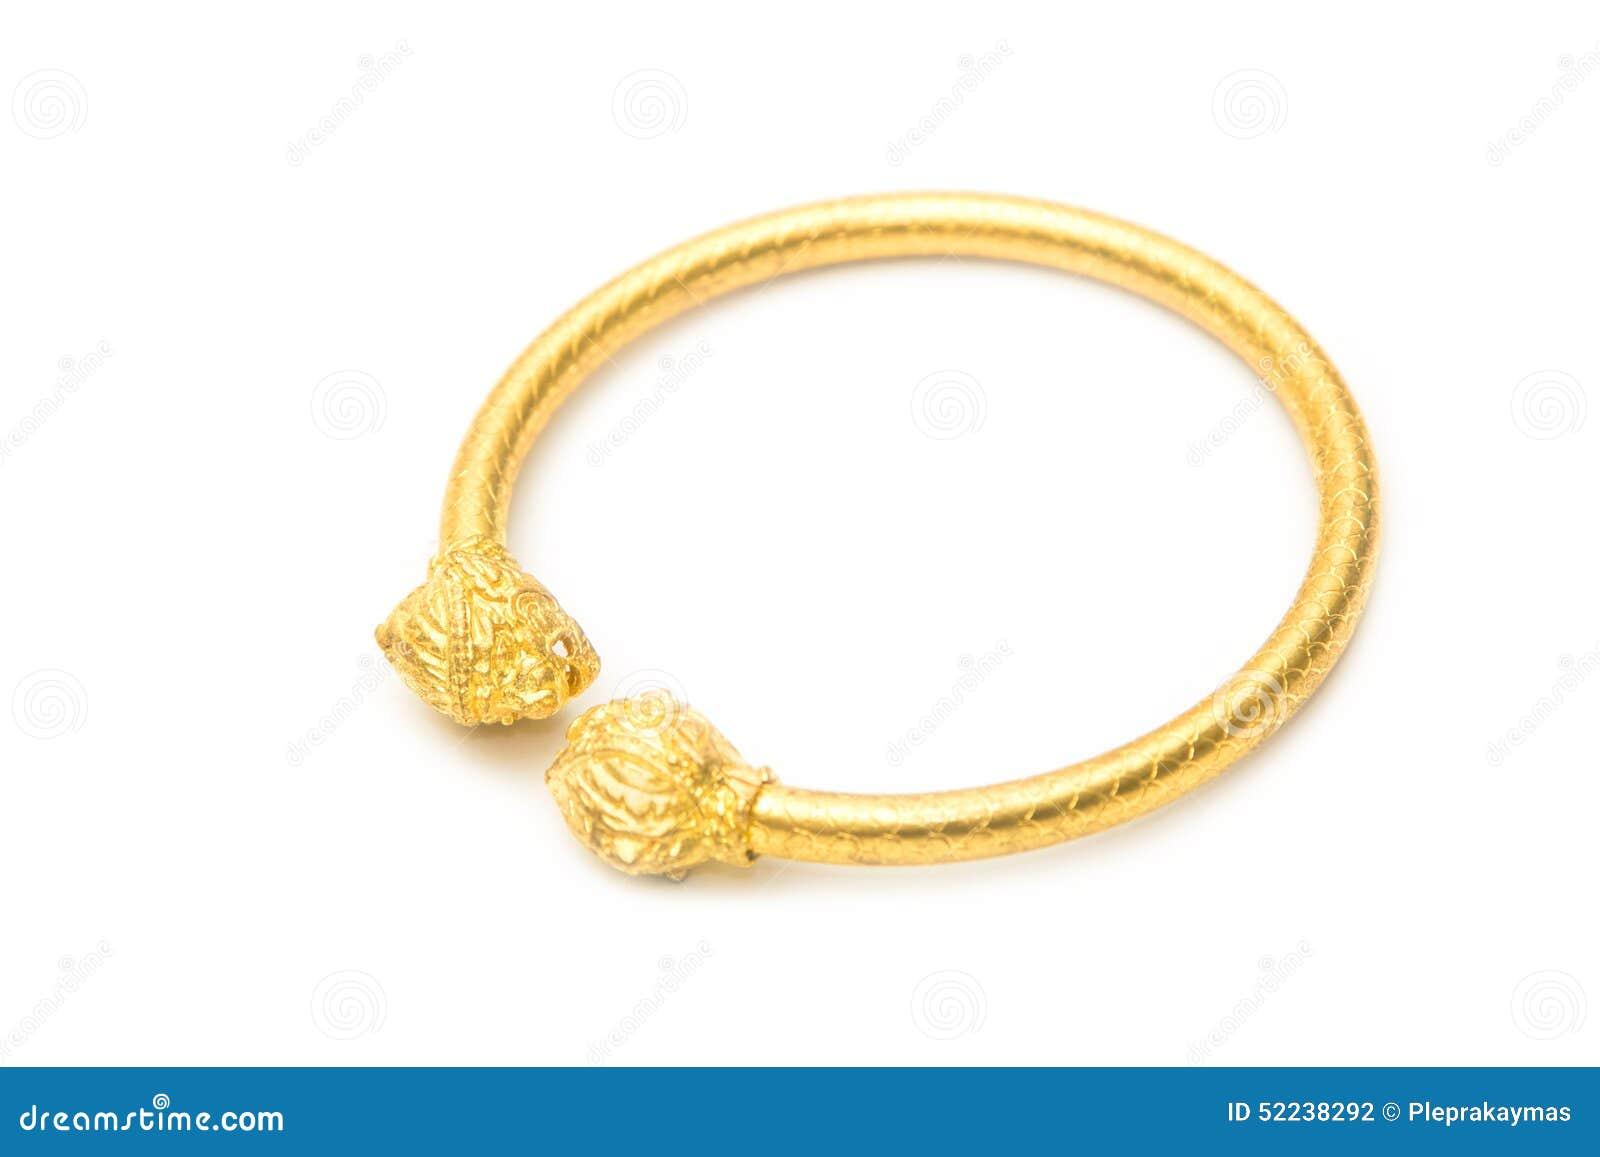 Thai gold bracelet design stock photo. Image of curve - 52238292